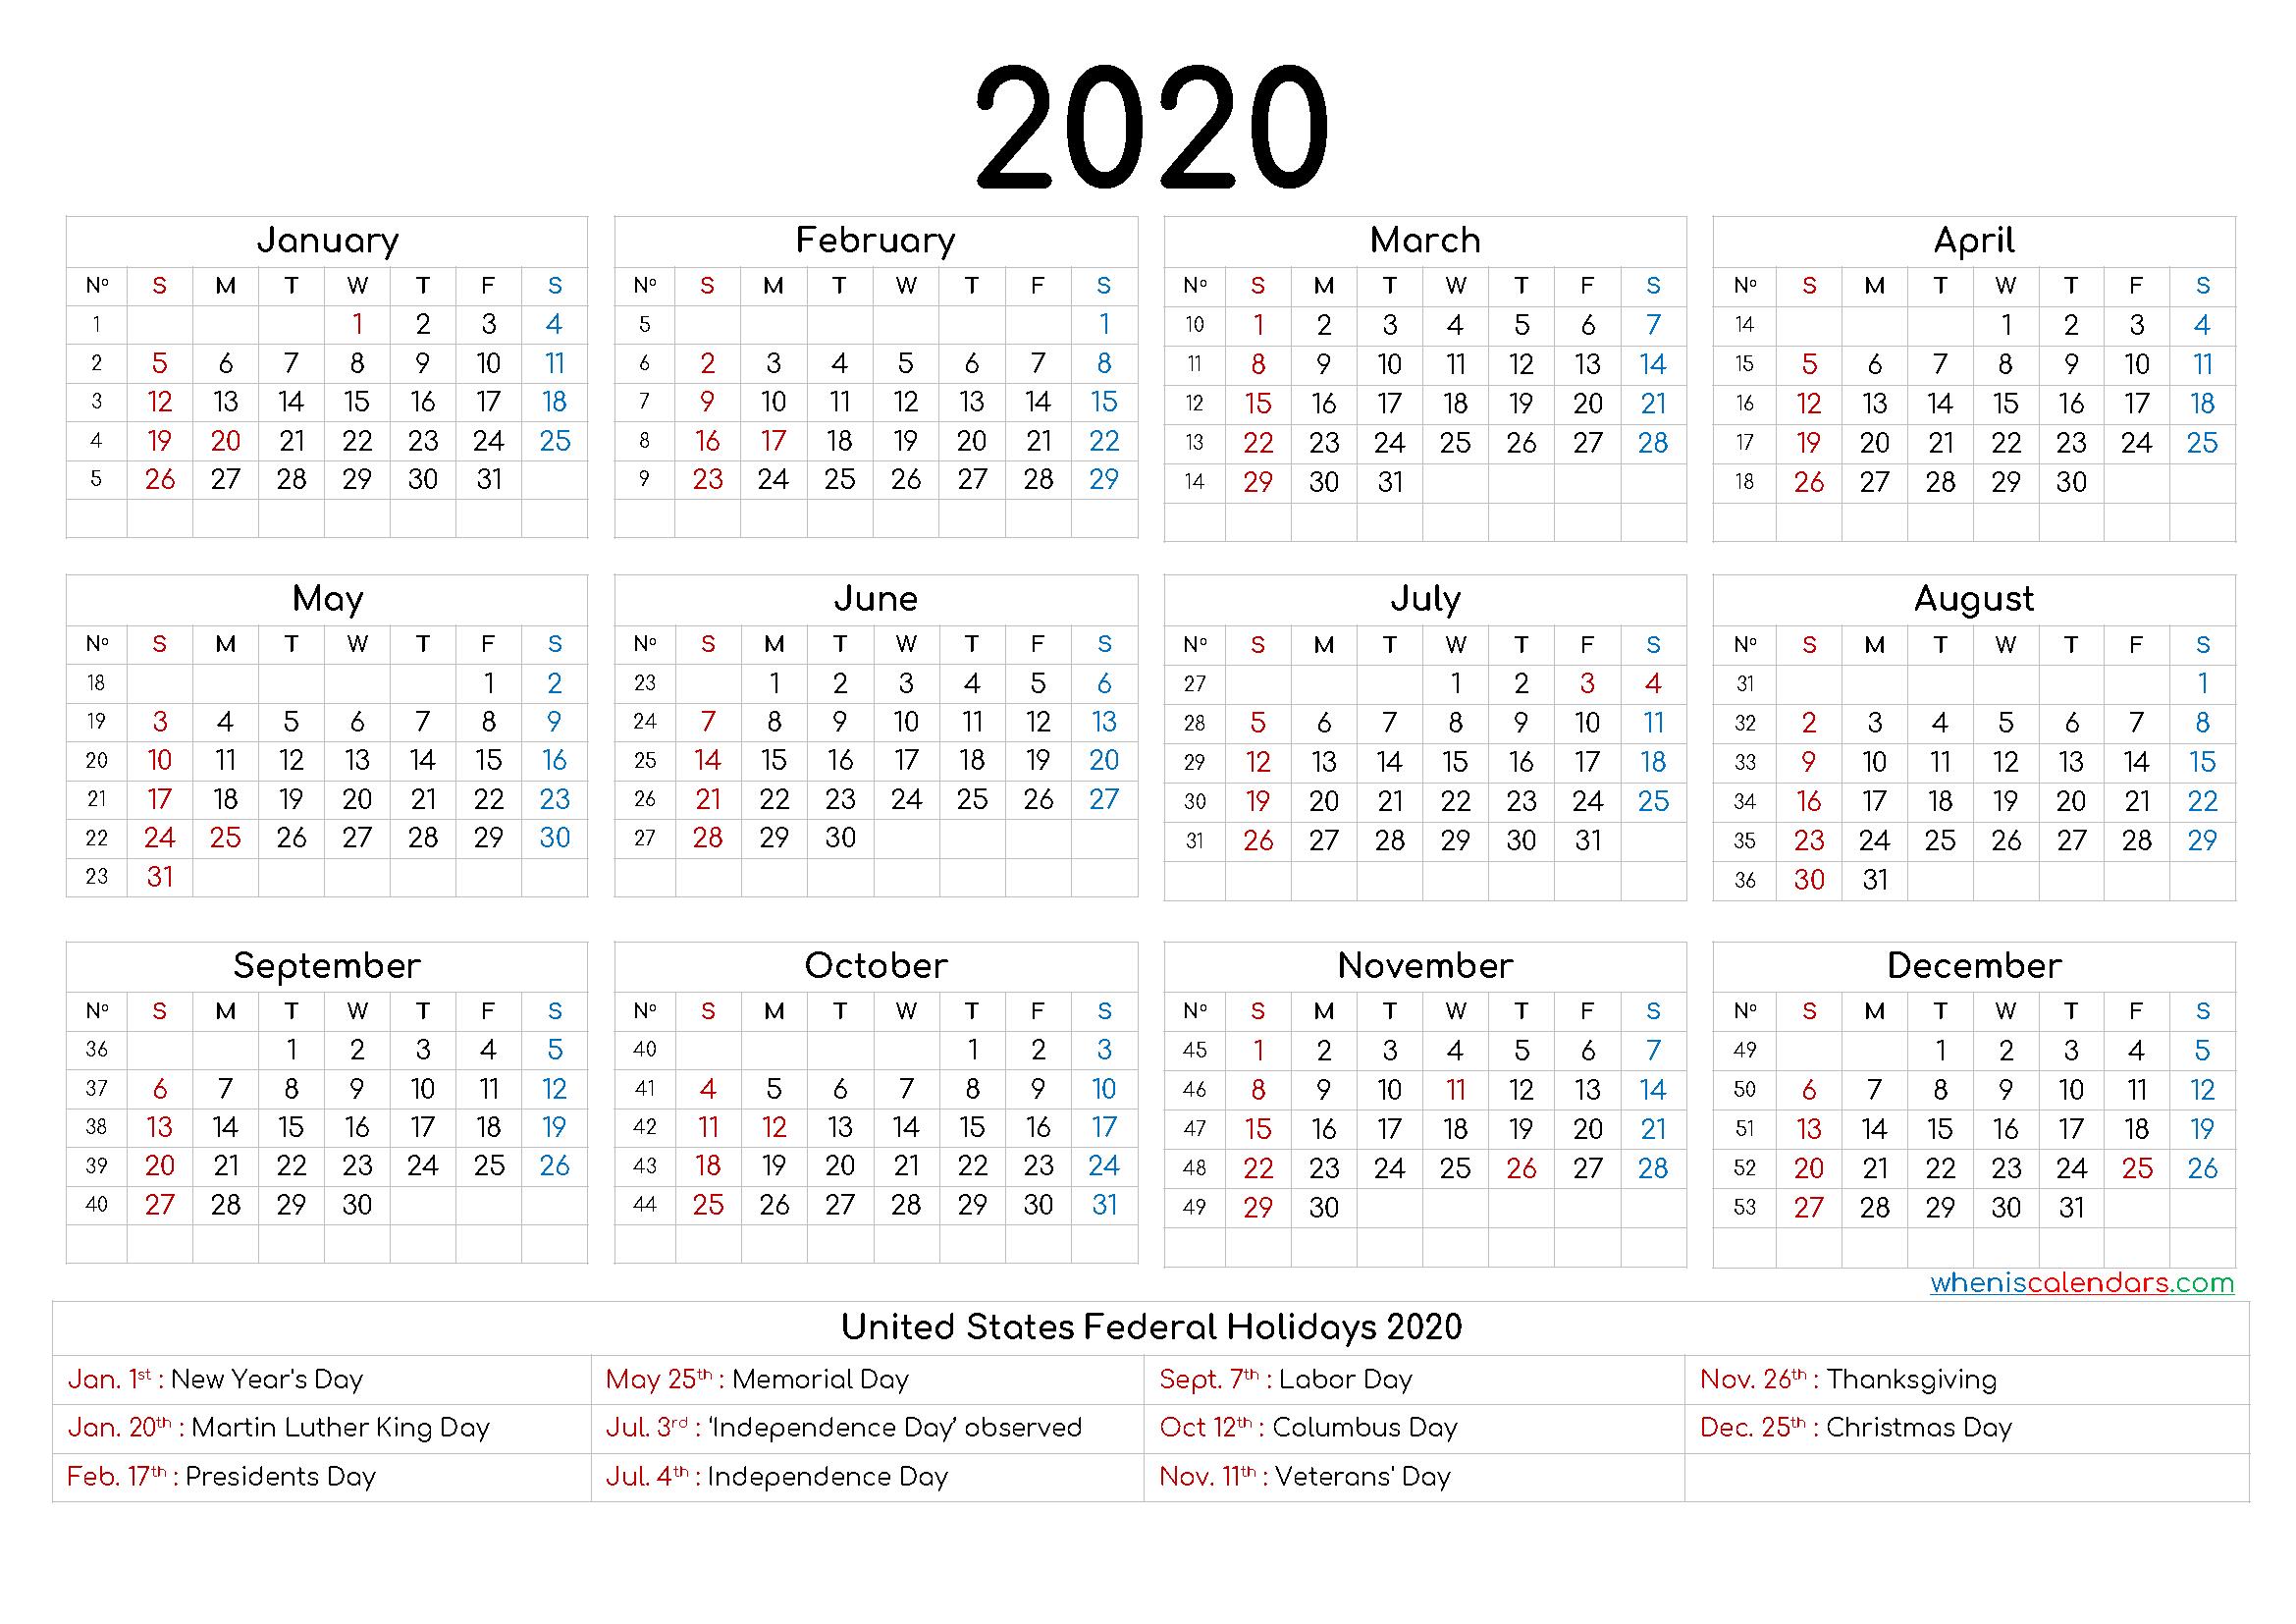 Free Printable 2020 Calendar with Holidays